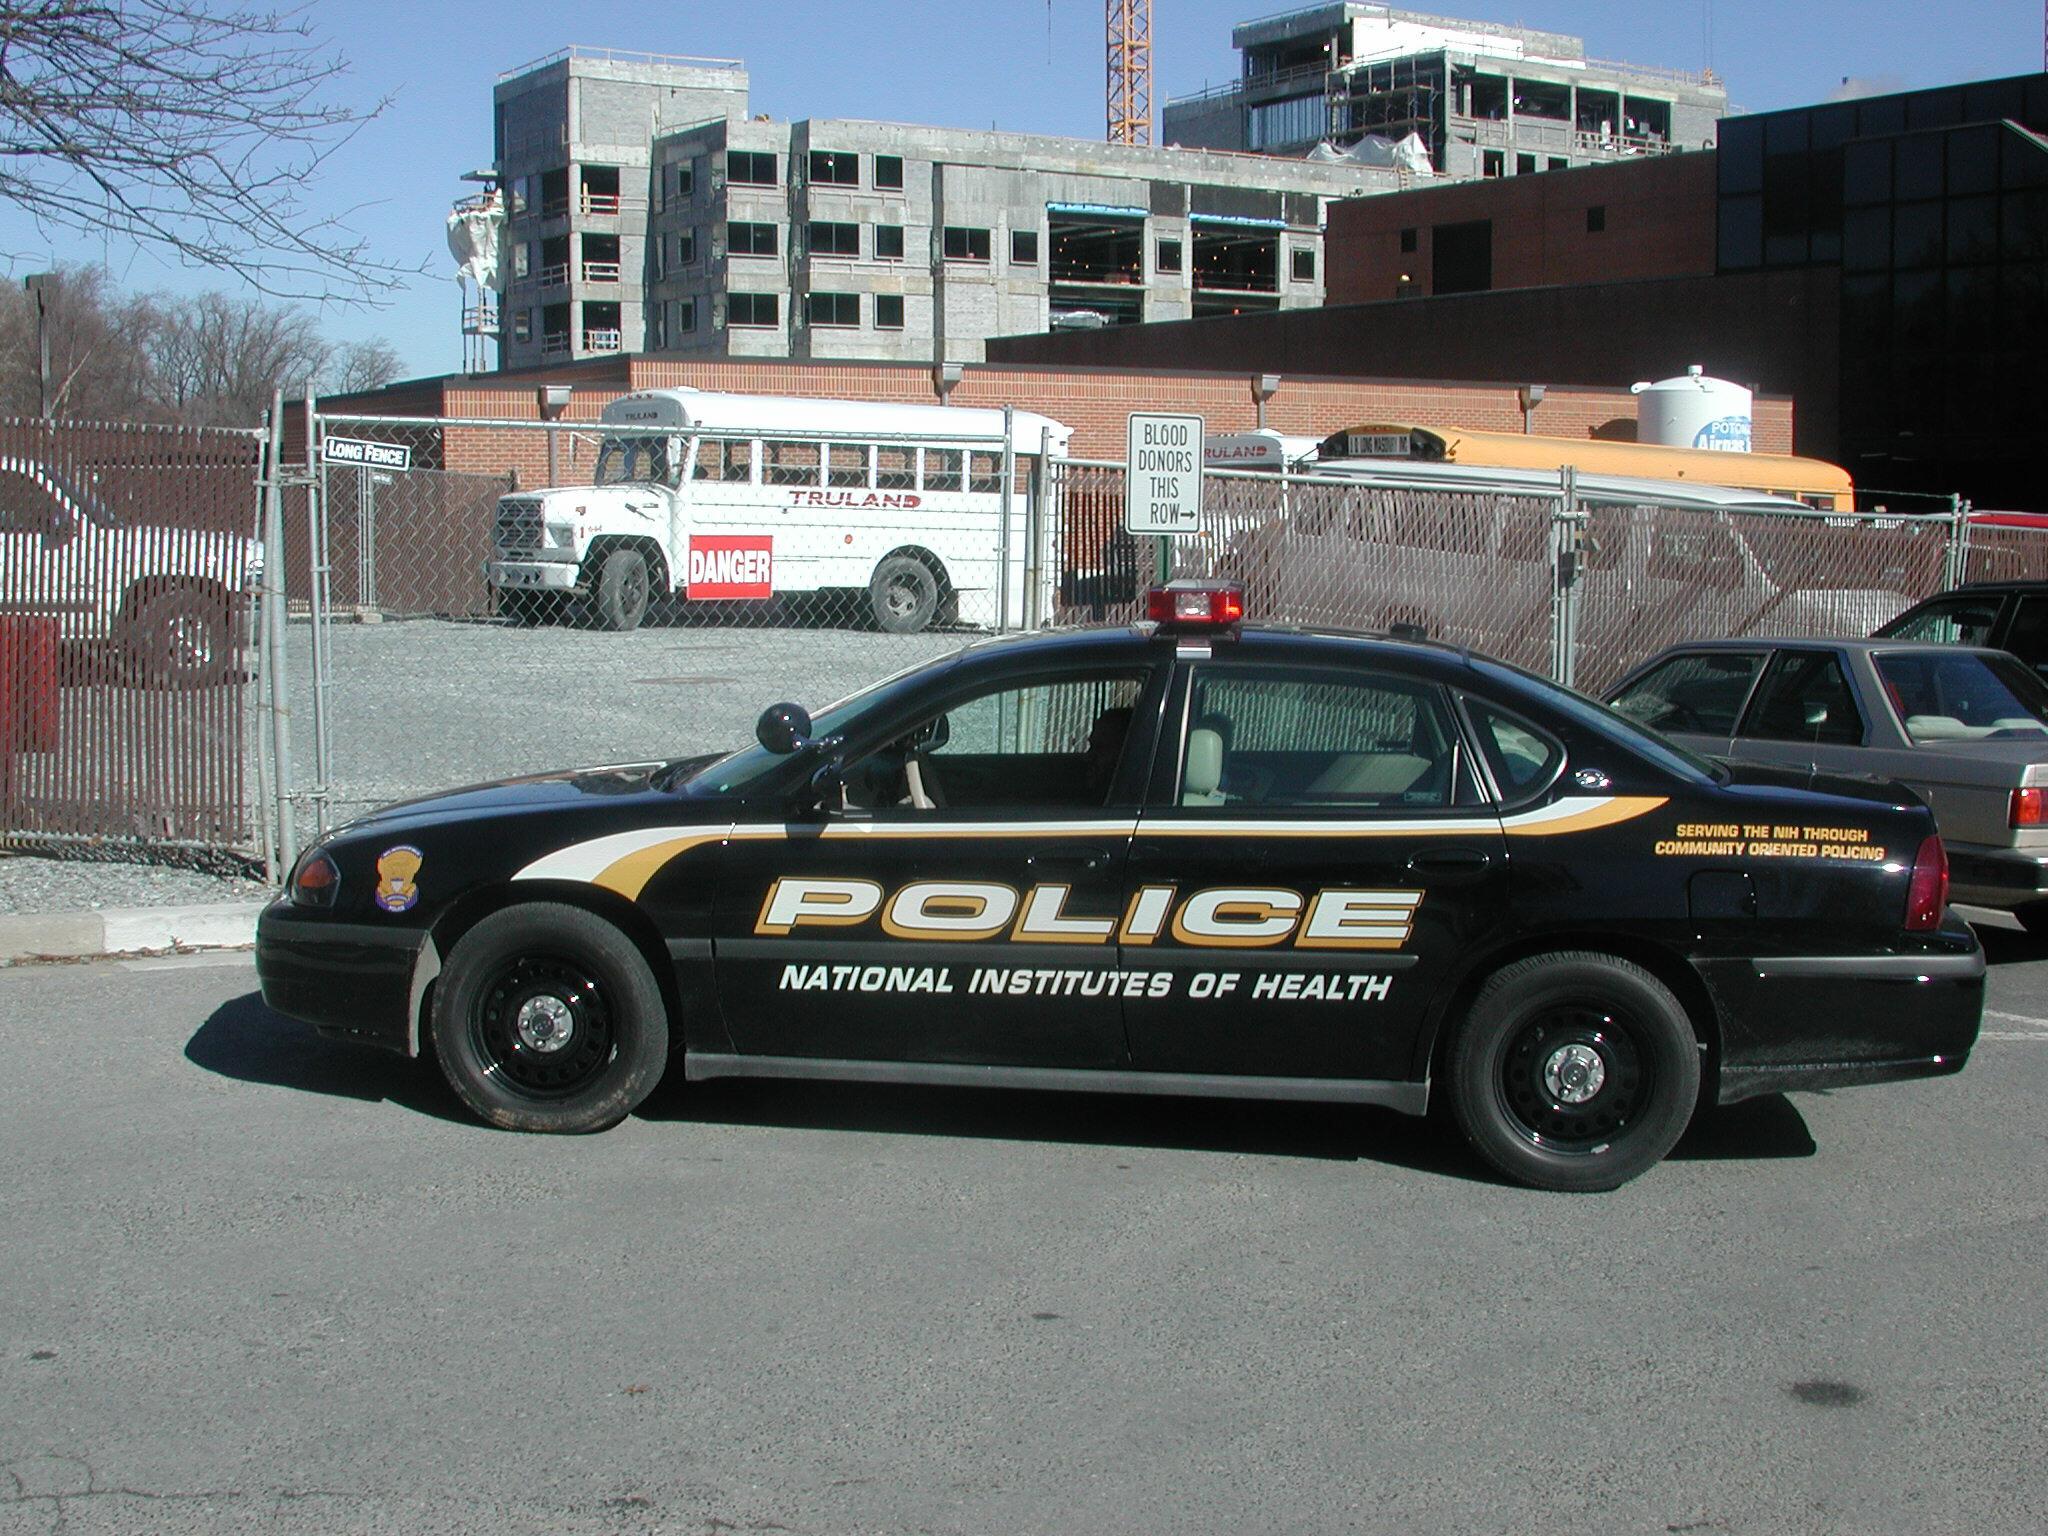 Police patrol aloadofball Image collections